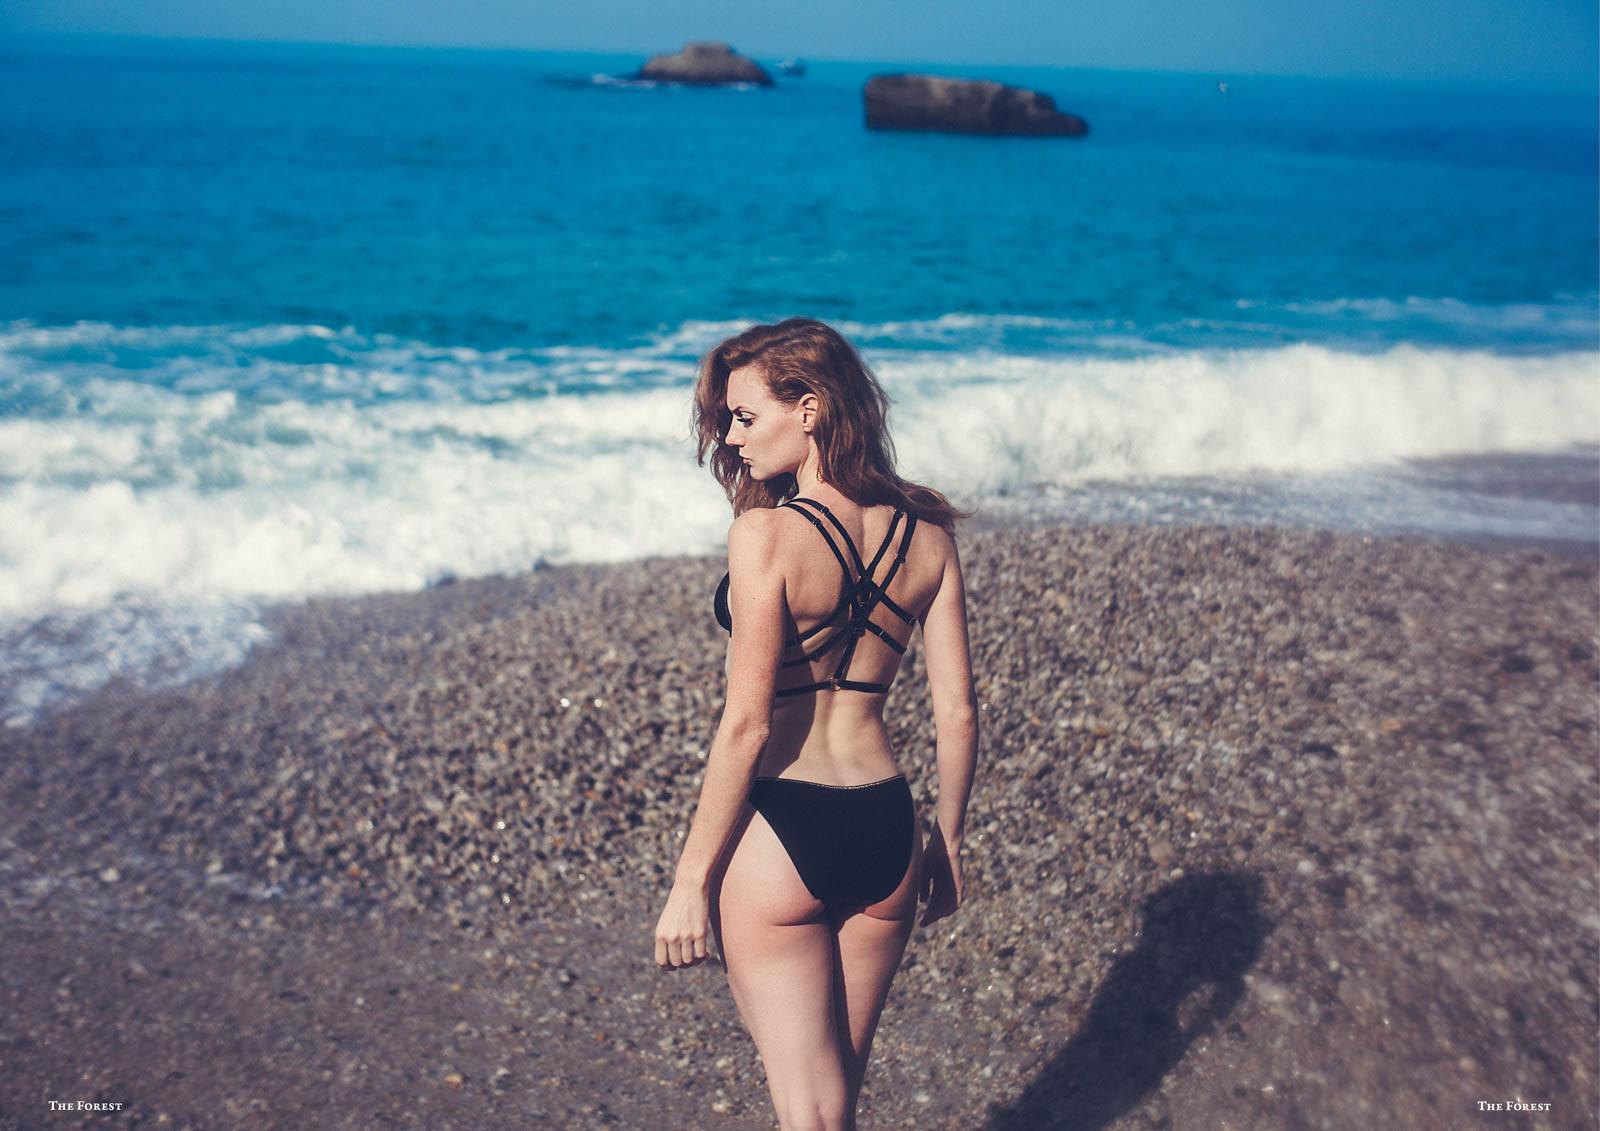 Youtube Chyler Leigh naked (75 photos), Tits, Hot, Feet, butt 2018